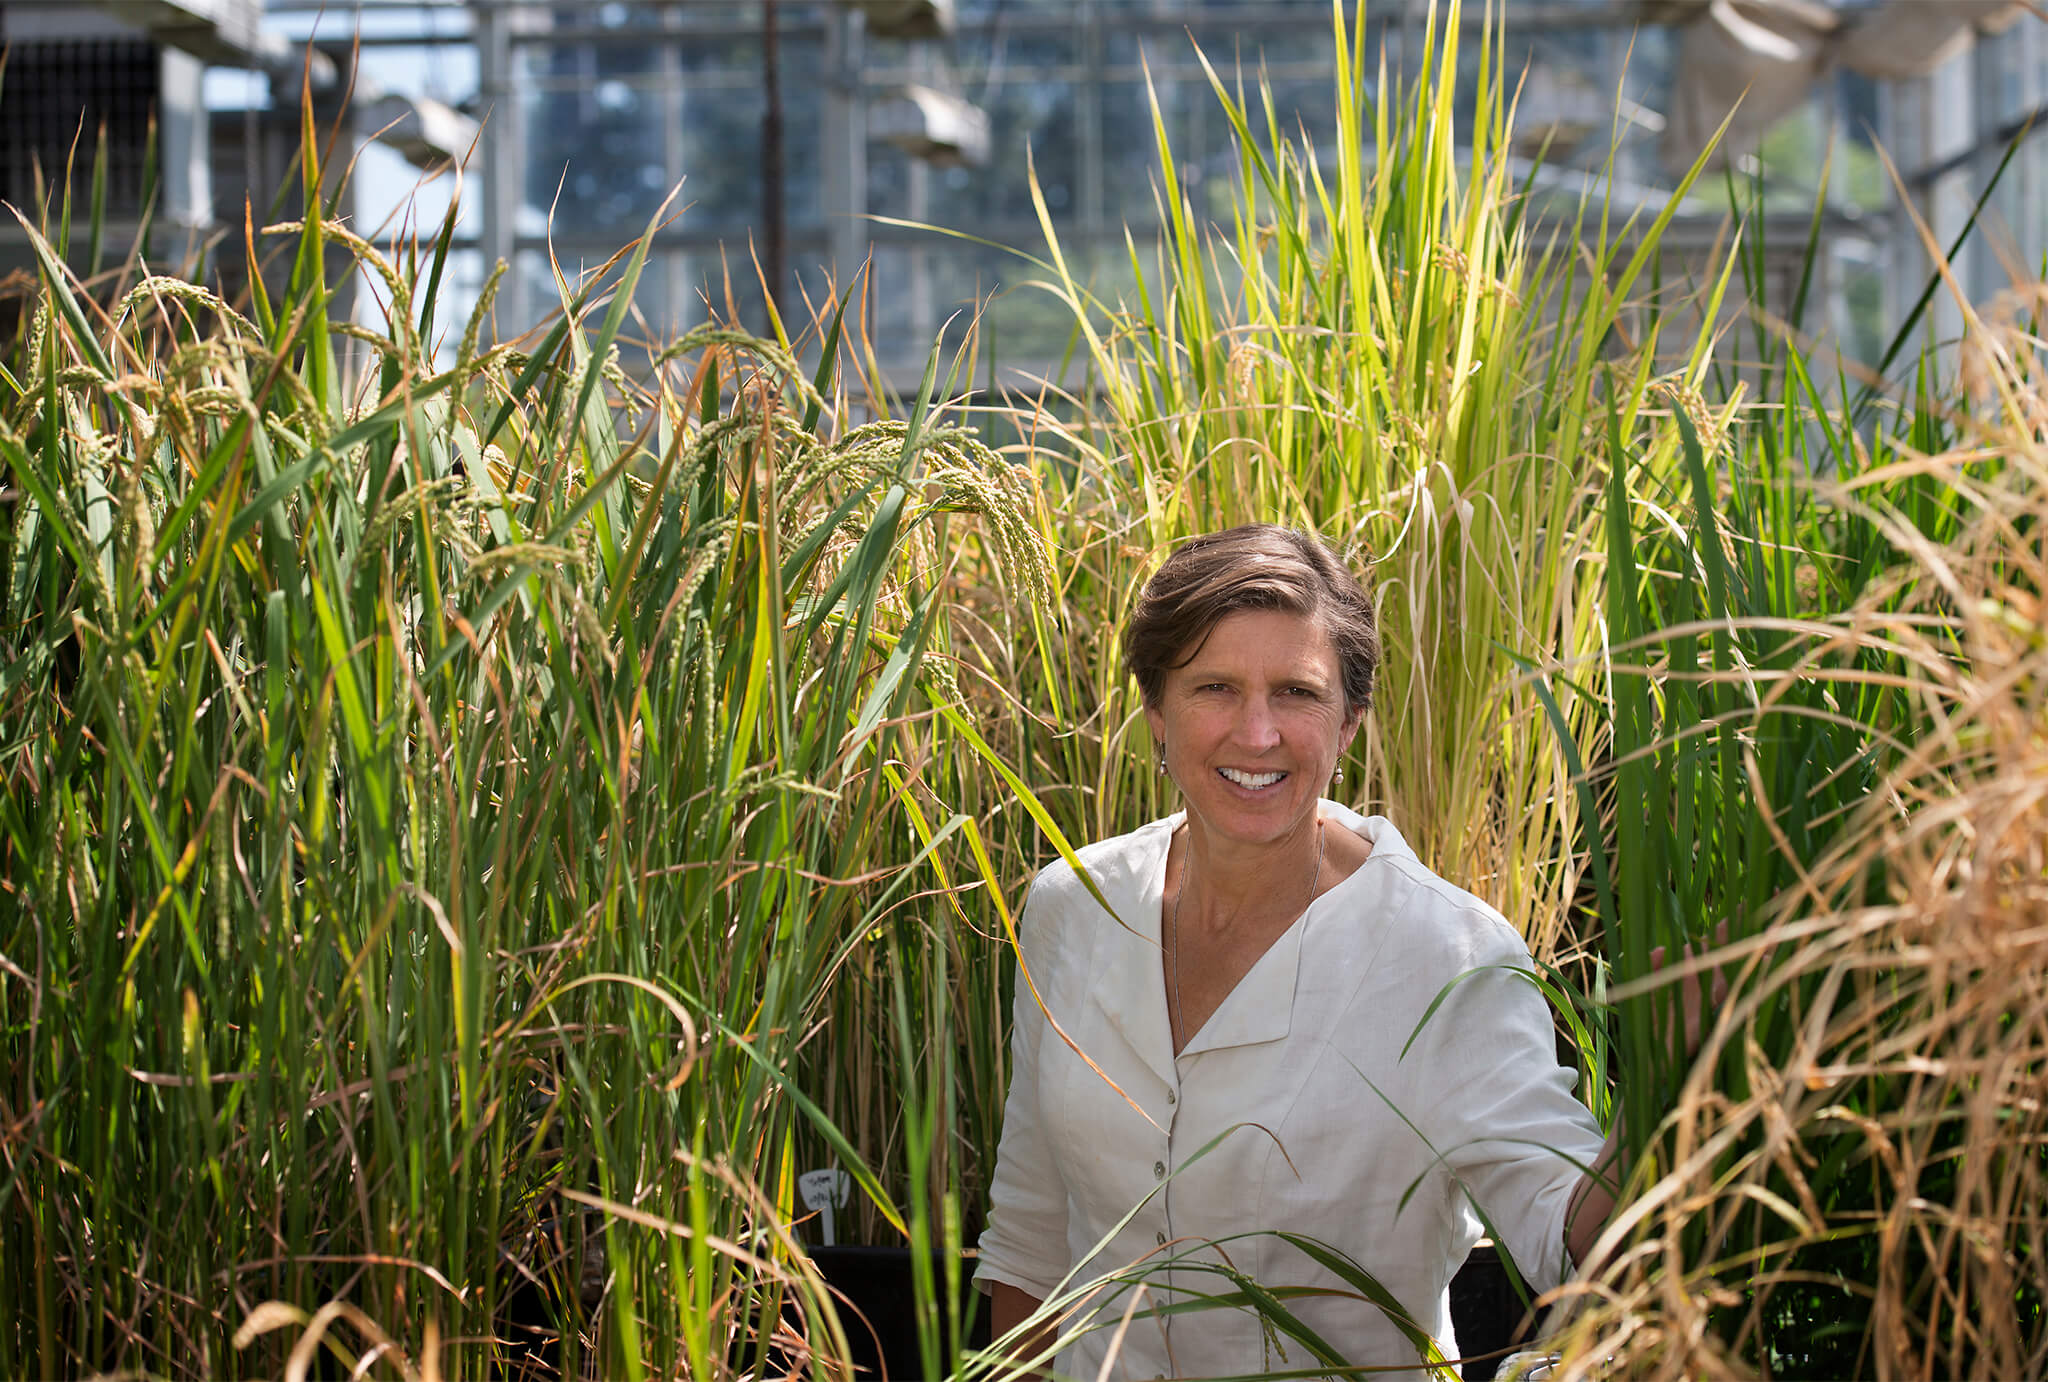 Women in science: Geneticist Pamela Ronald, developer of GMO flood-resistant rice